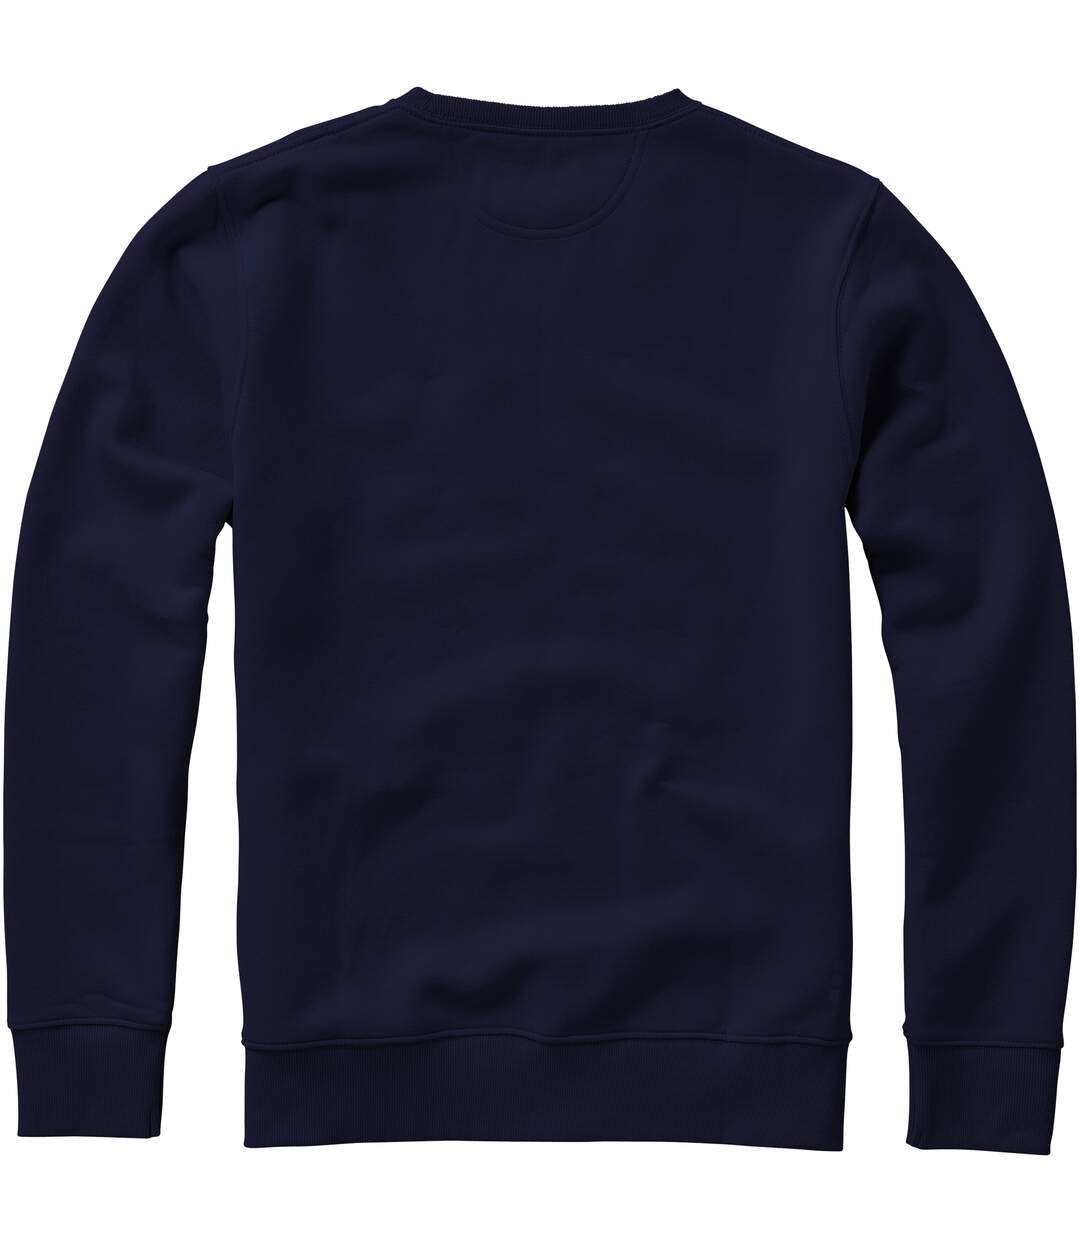 Elevate Mens Surrey Crew Neck Sweater (Navy) - UTPF1849